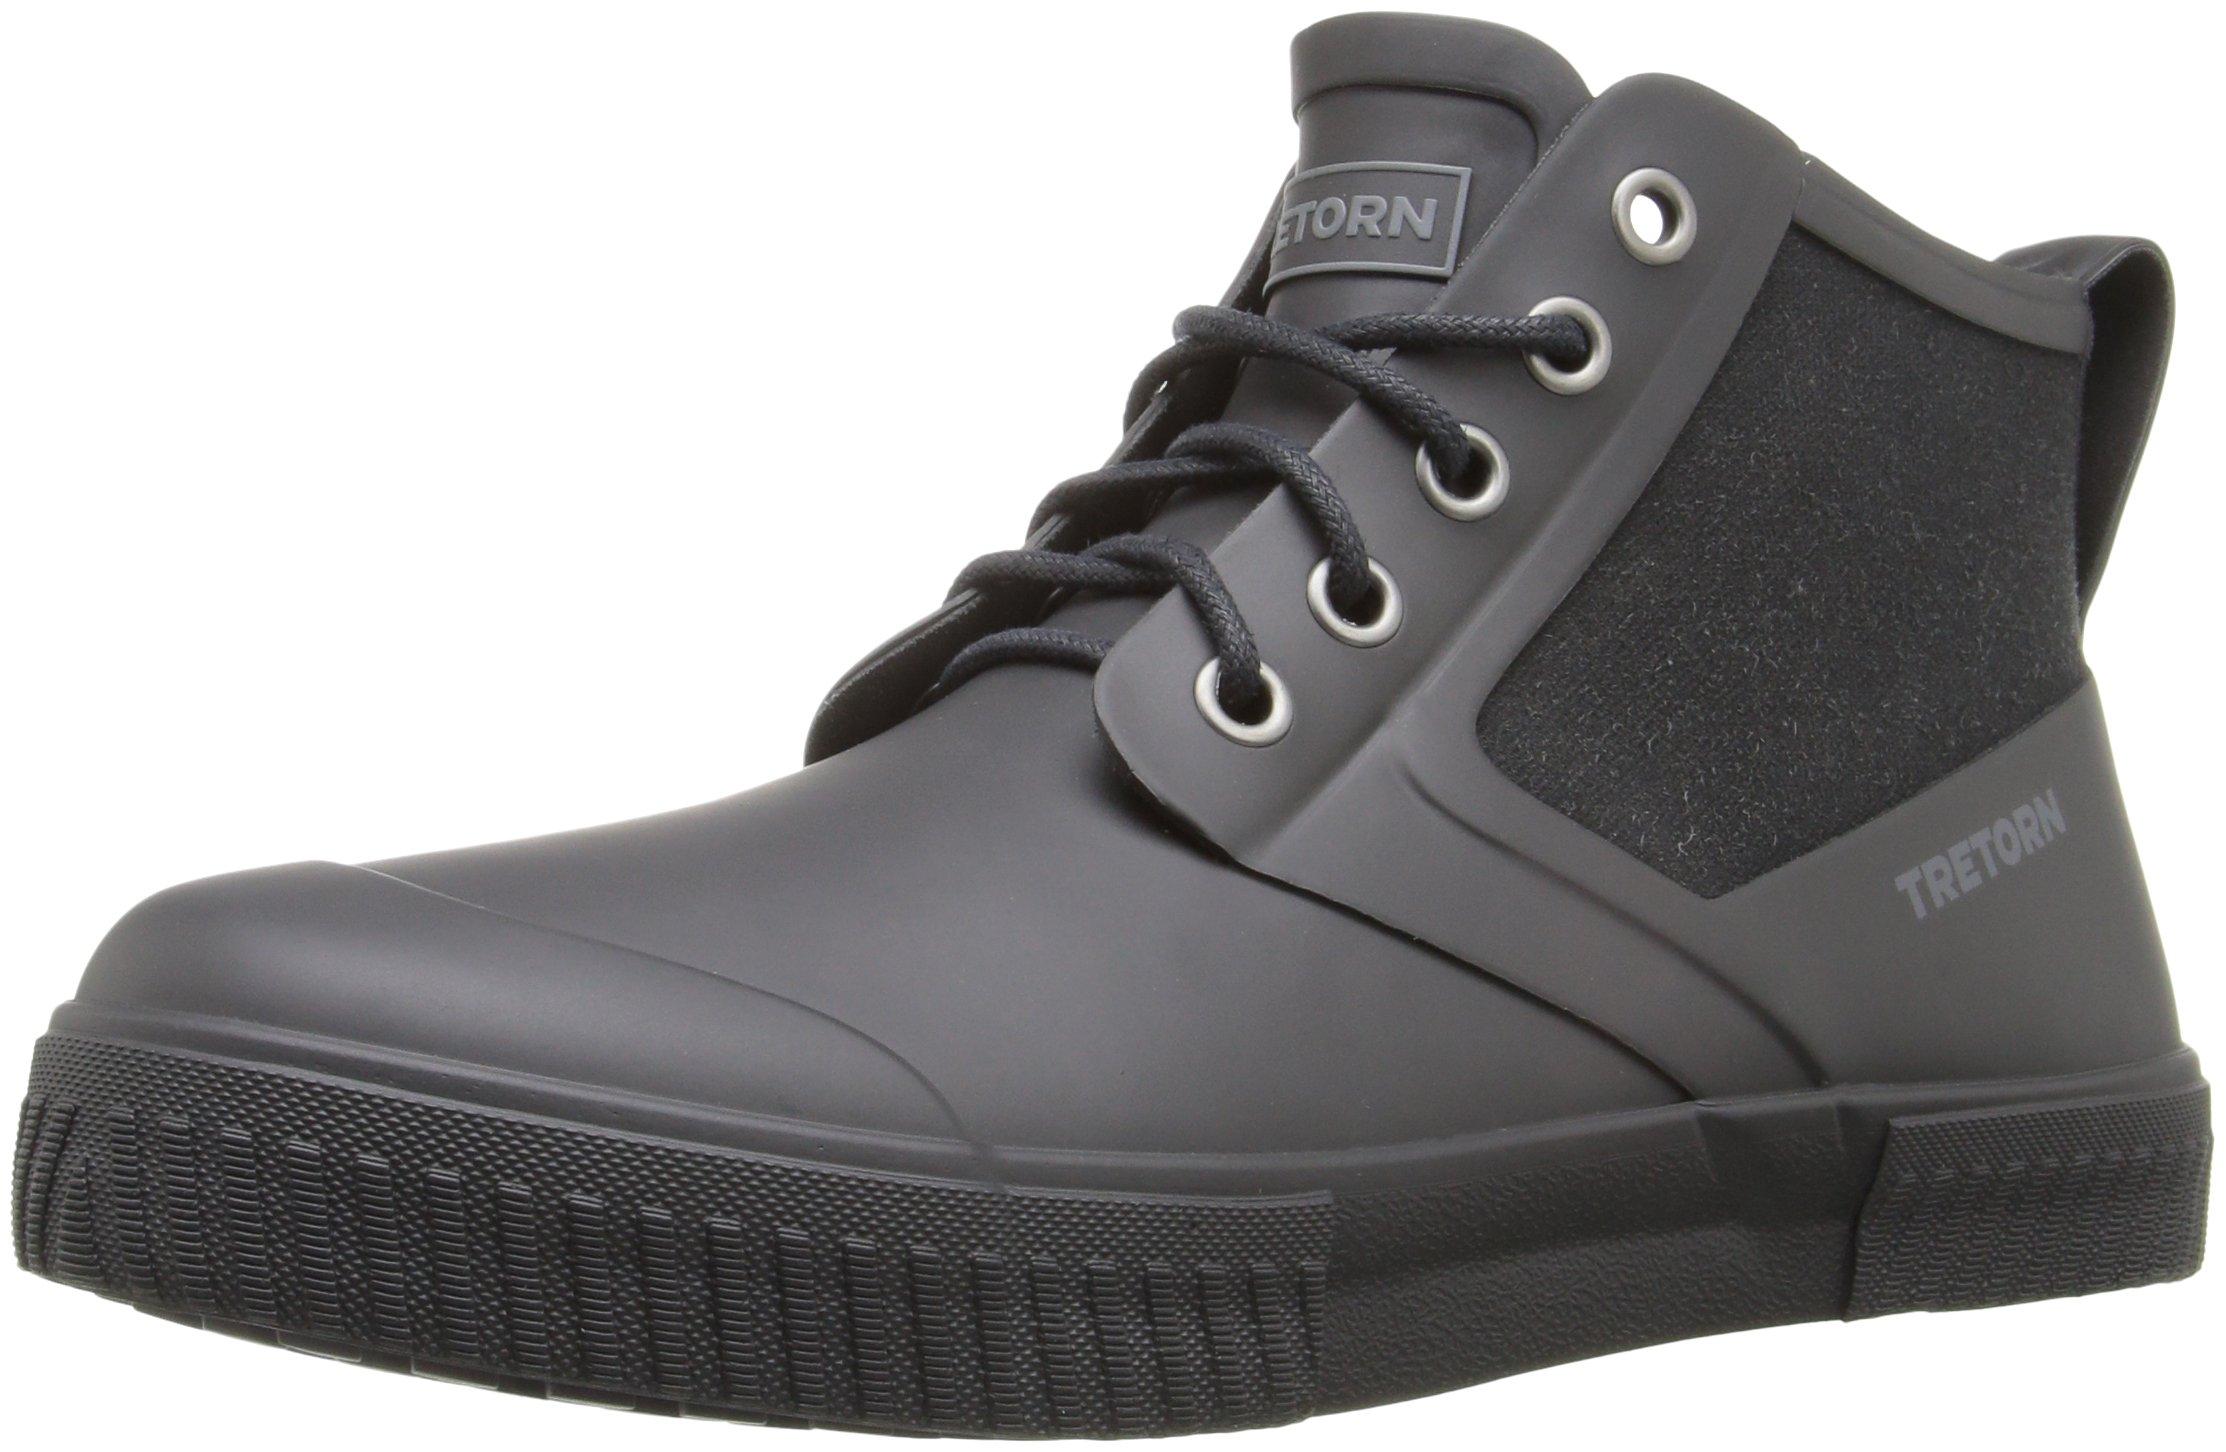 Tretorn Men's Gill Rain Boot, Black/Black, 12 M US